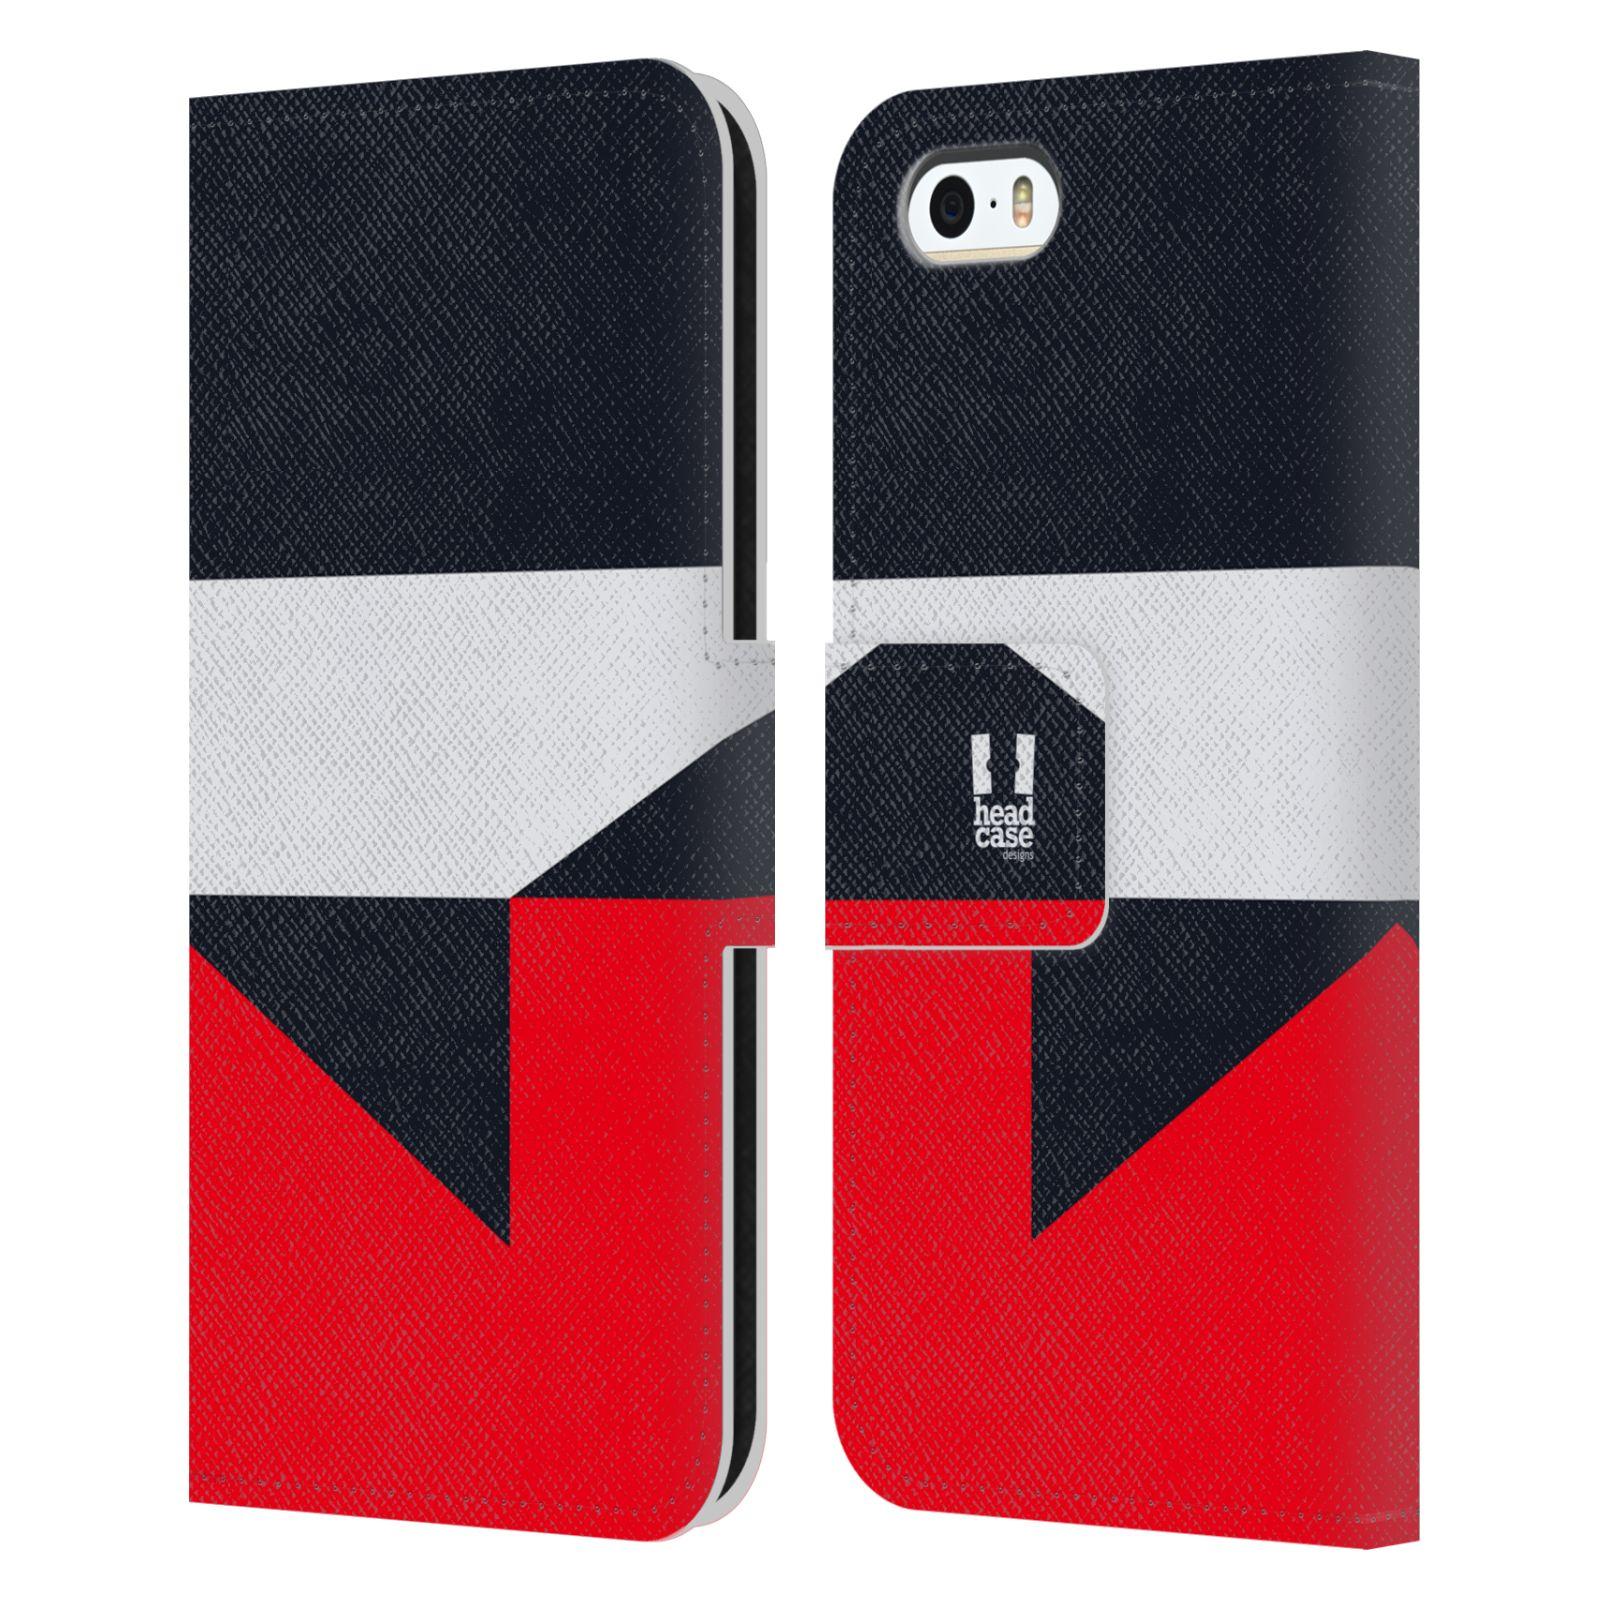 HEAD CASE Flipové pouzdro pro mobil Apple Iphone 5/5S barevné tvary černá a červená gejša